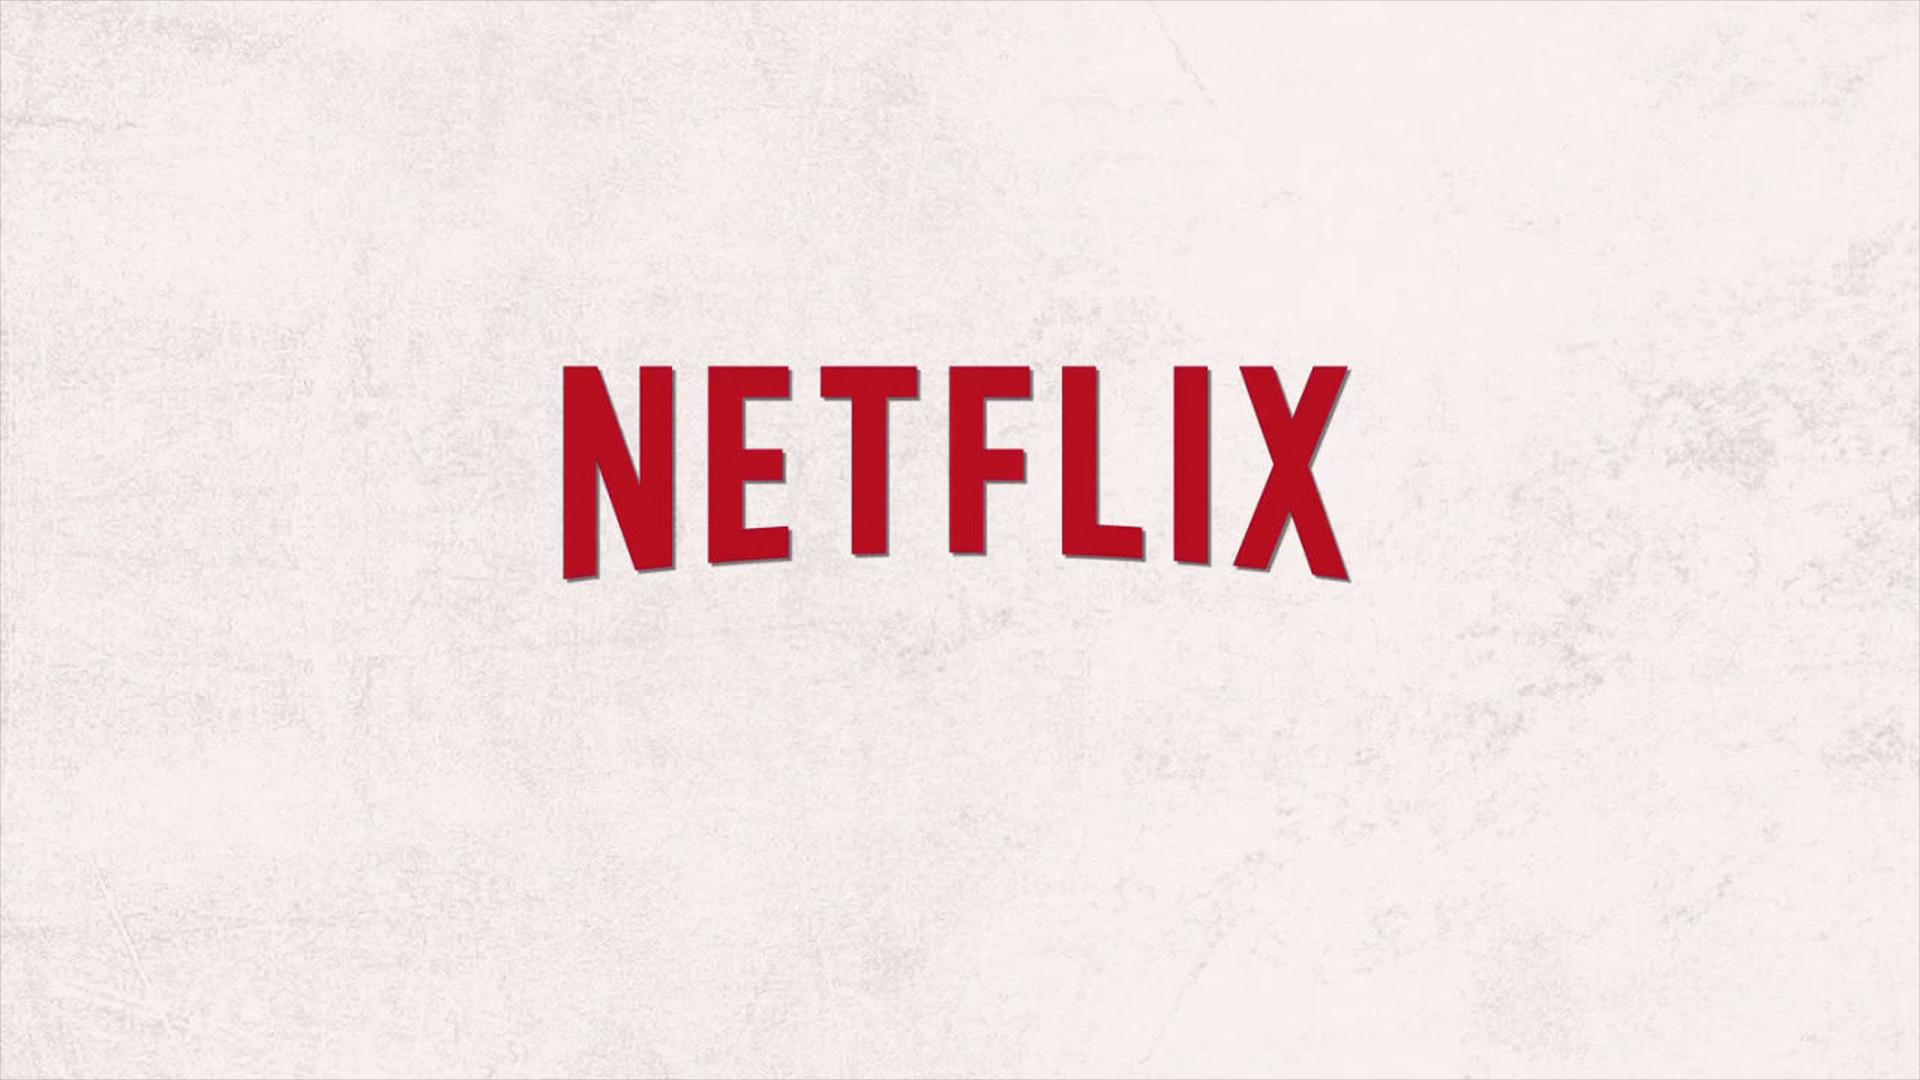 new netflix logo.jpg